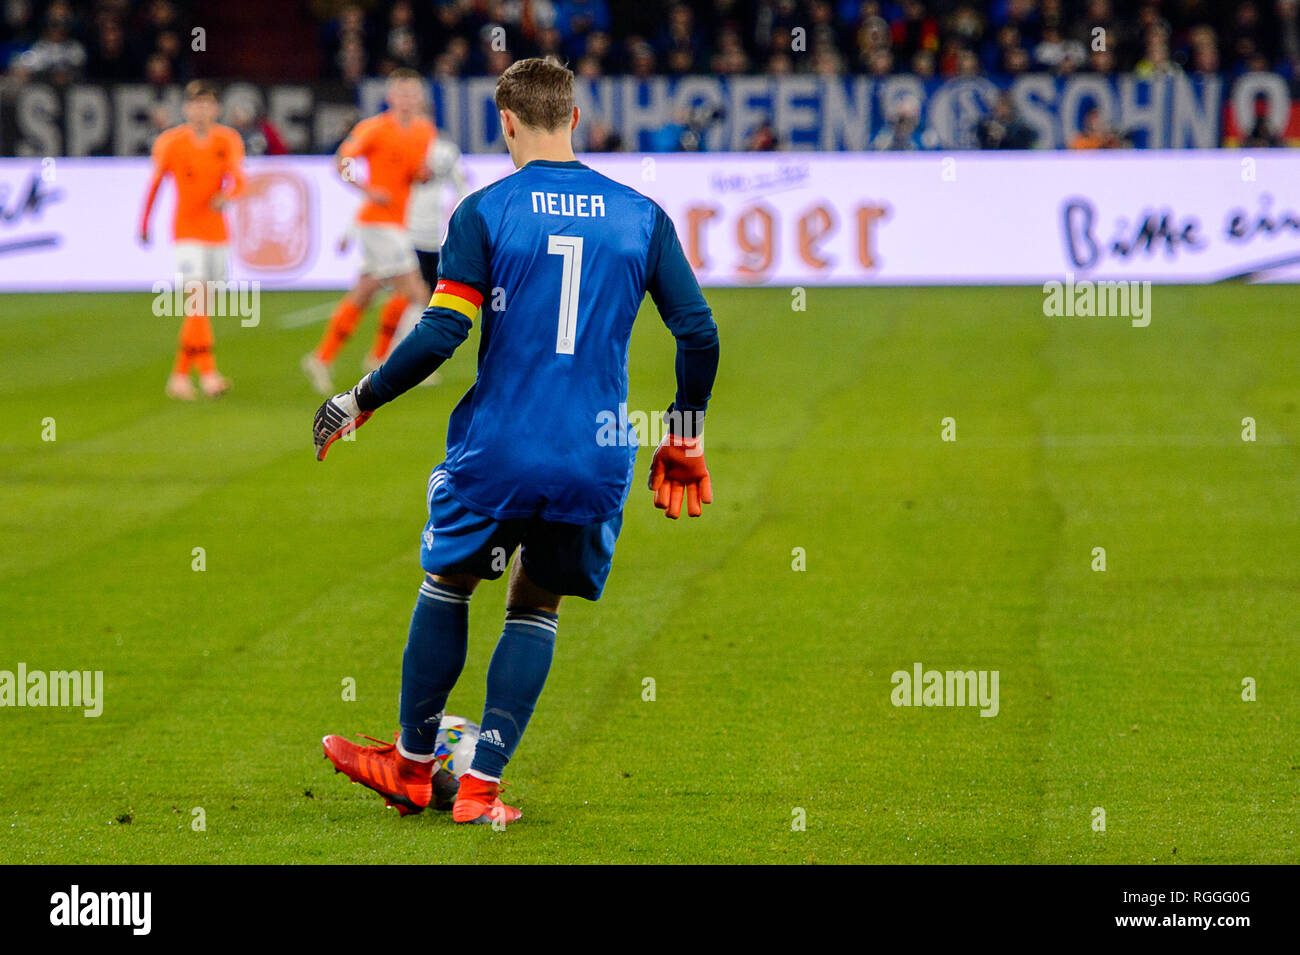 GELSENKIRCHEN - NOV 19, 2018: Manuel Neuer 1. Germany - Netherlands. UEFA Nations League. Schalke 04 stadium. - Stock Image